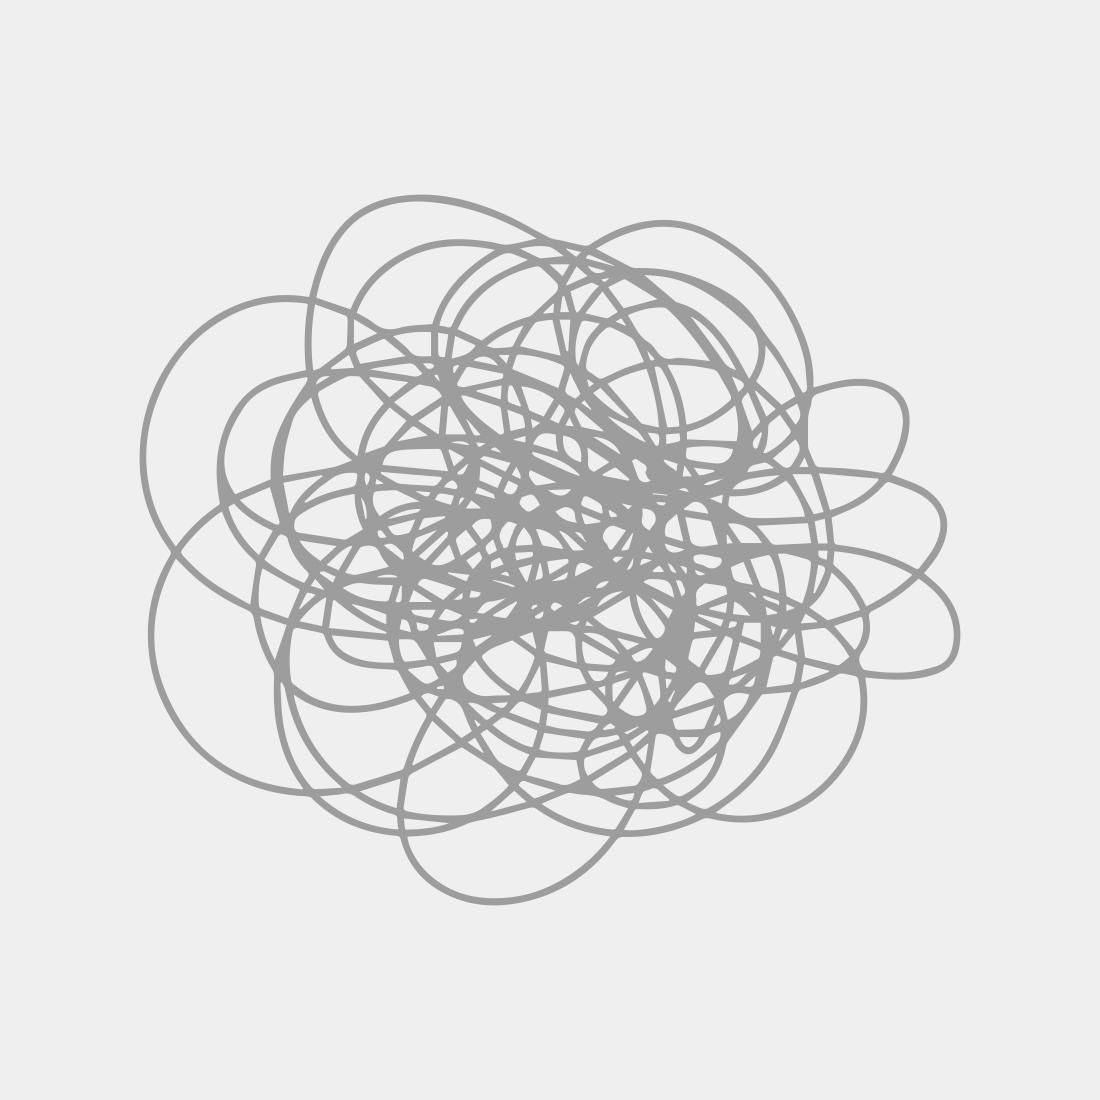 ** Pre Order Date 21DEC20 ** Varnishing Day Portfolio Frame, Black Ash